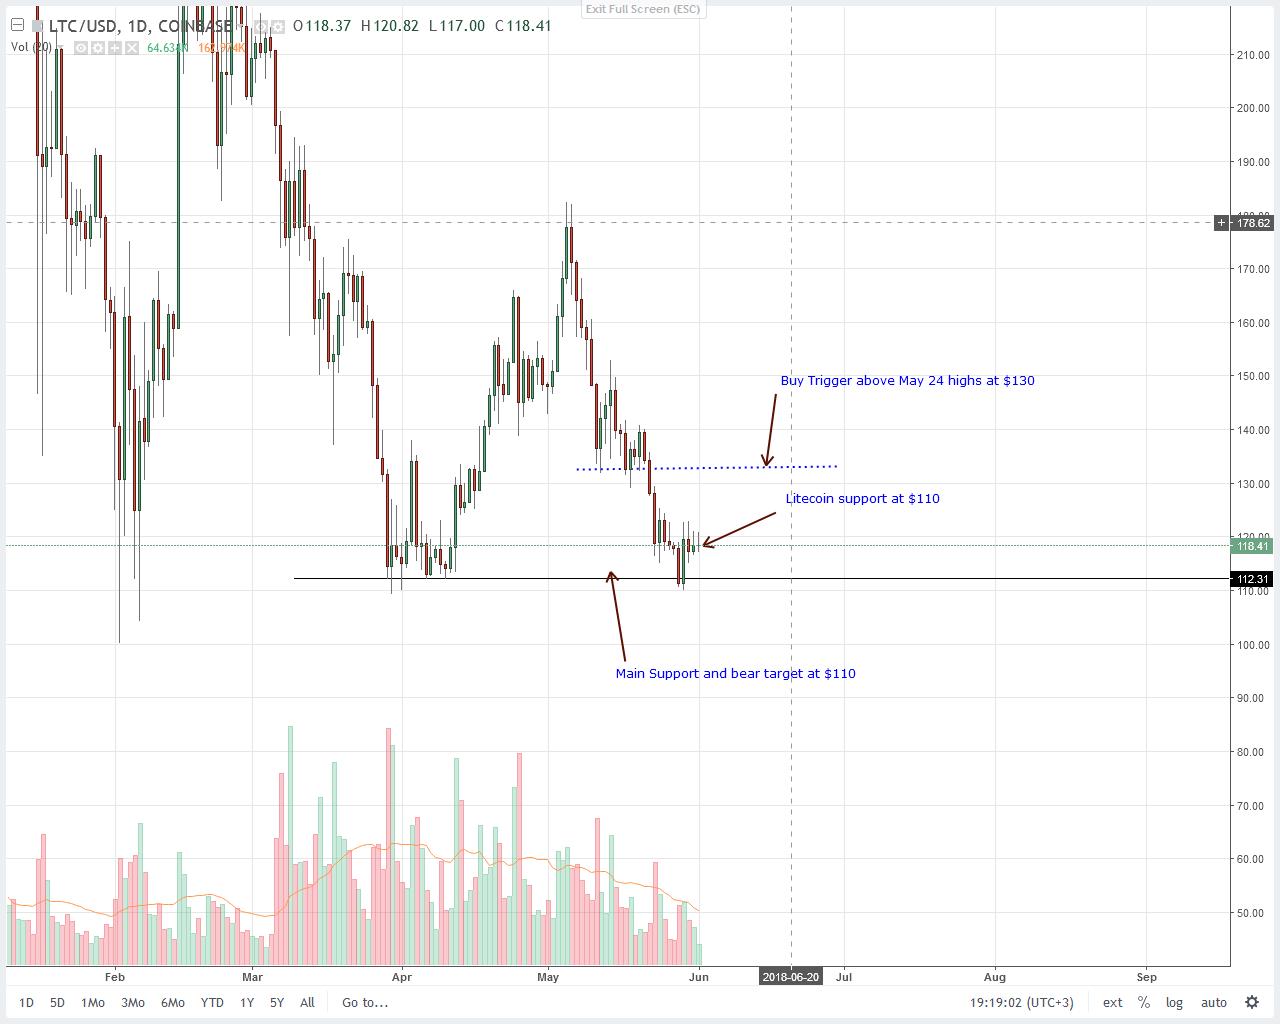 Litecoin (LTC) Price Technical Analysis